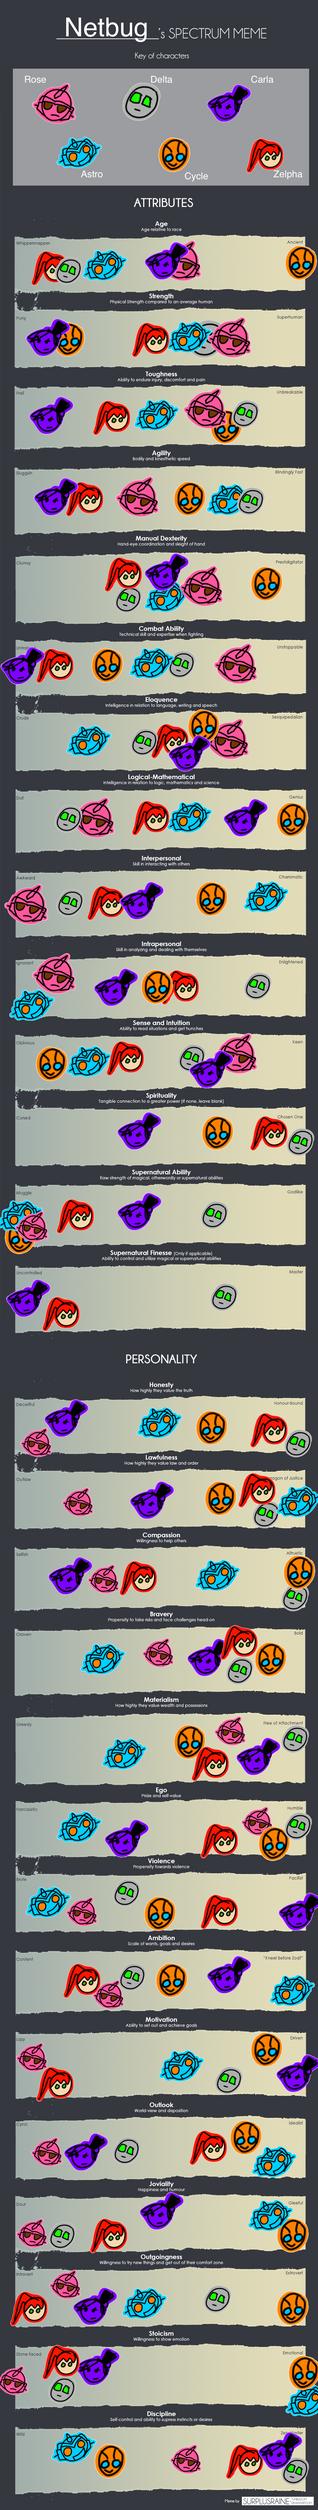 Character Spectrum Meme by Netbug009